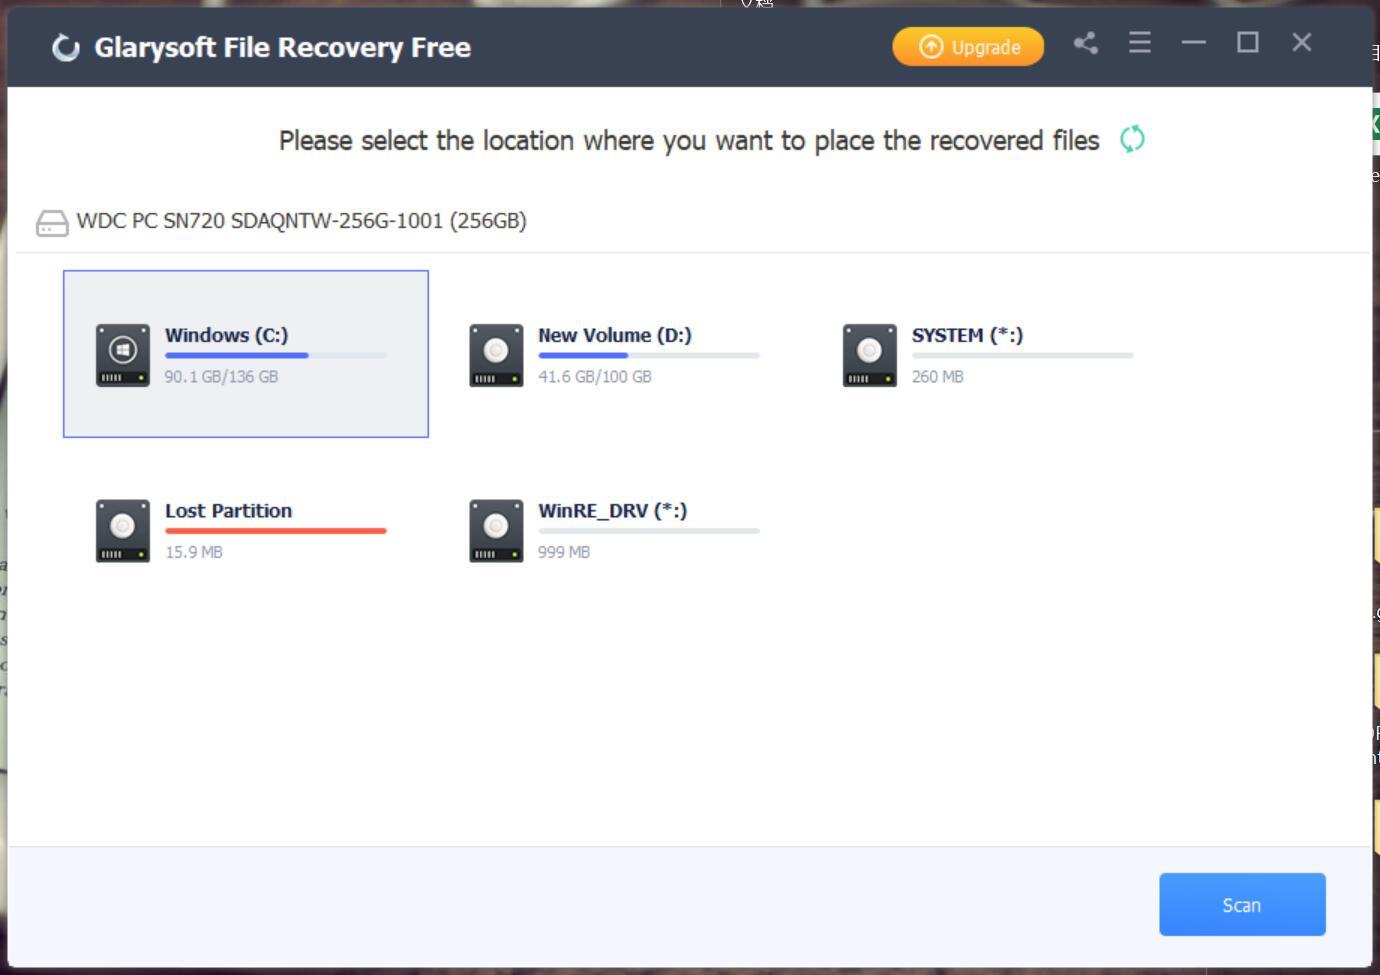 Glarysoft File Recovery